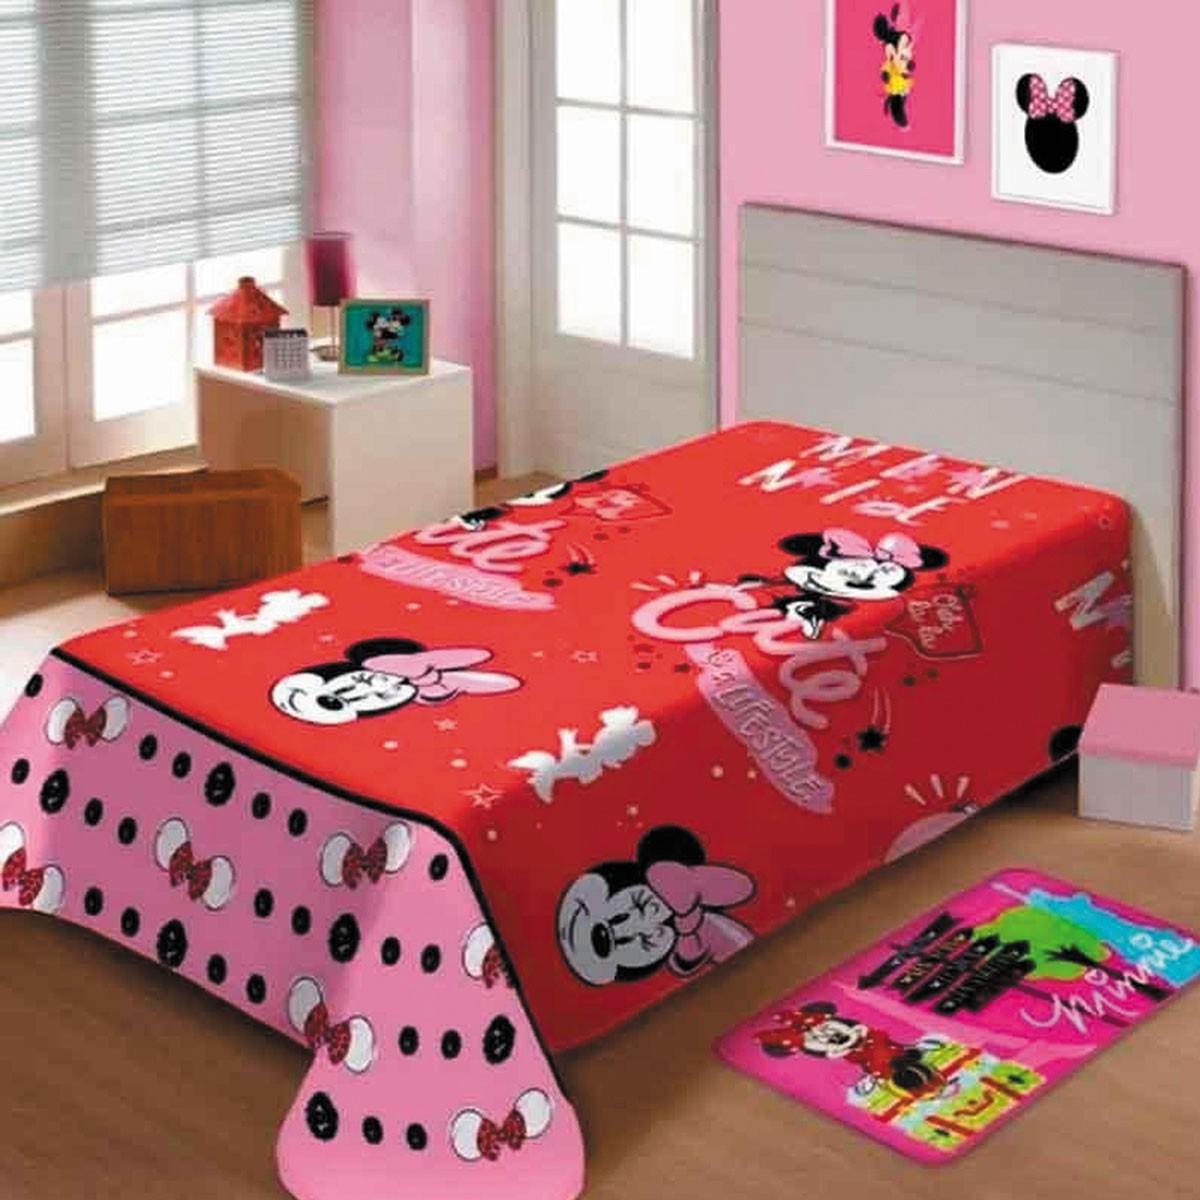 Cobertor Infantil Minnie Mouse Manta Fleece Vermelha Jolitex